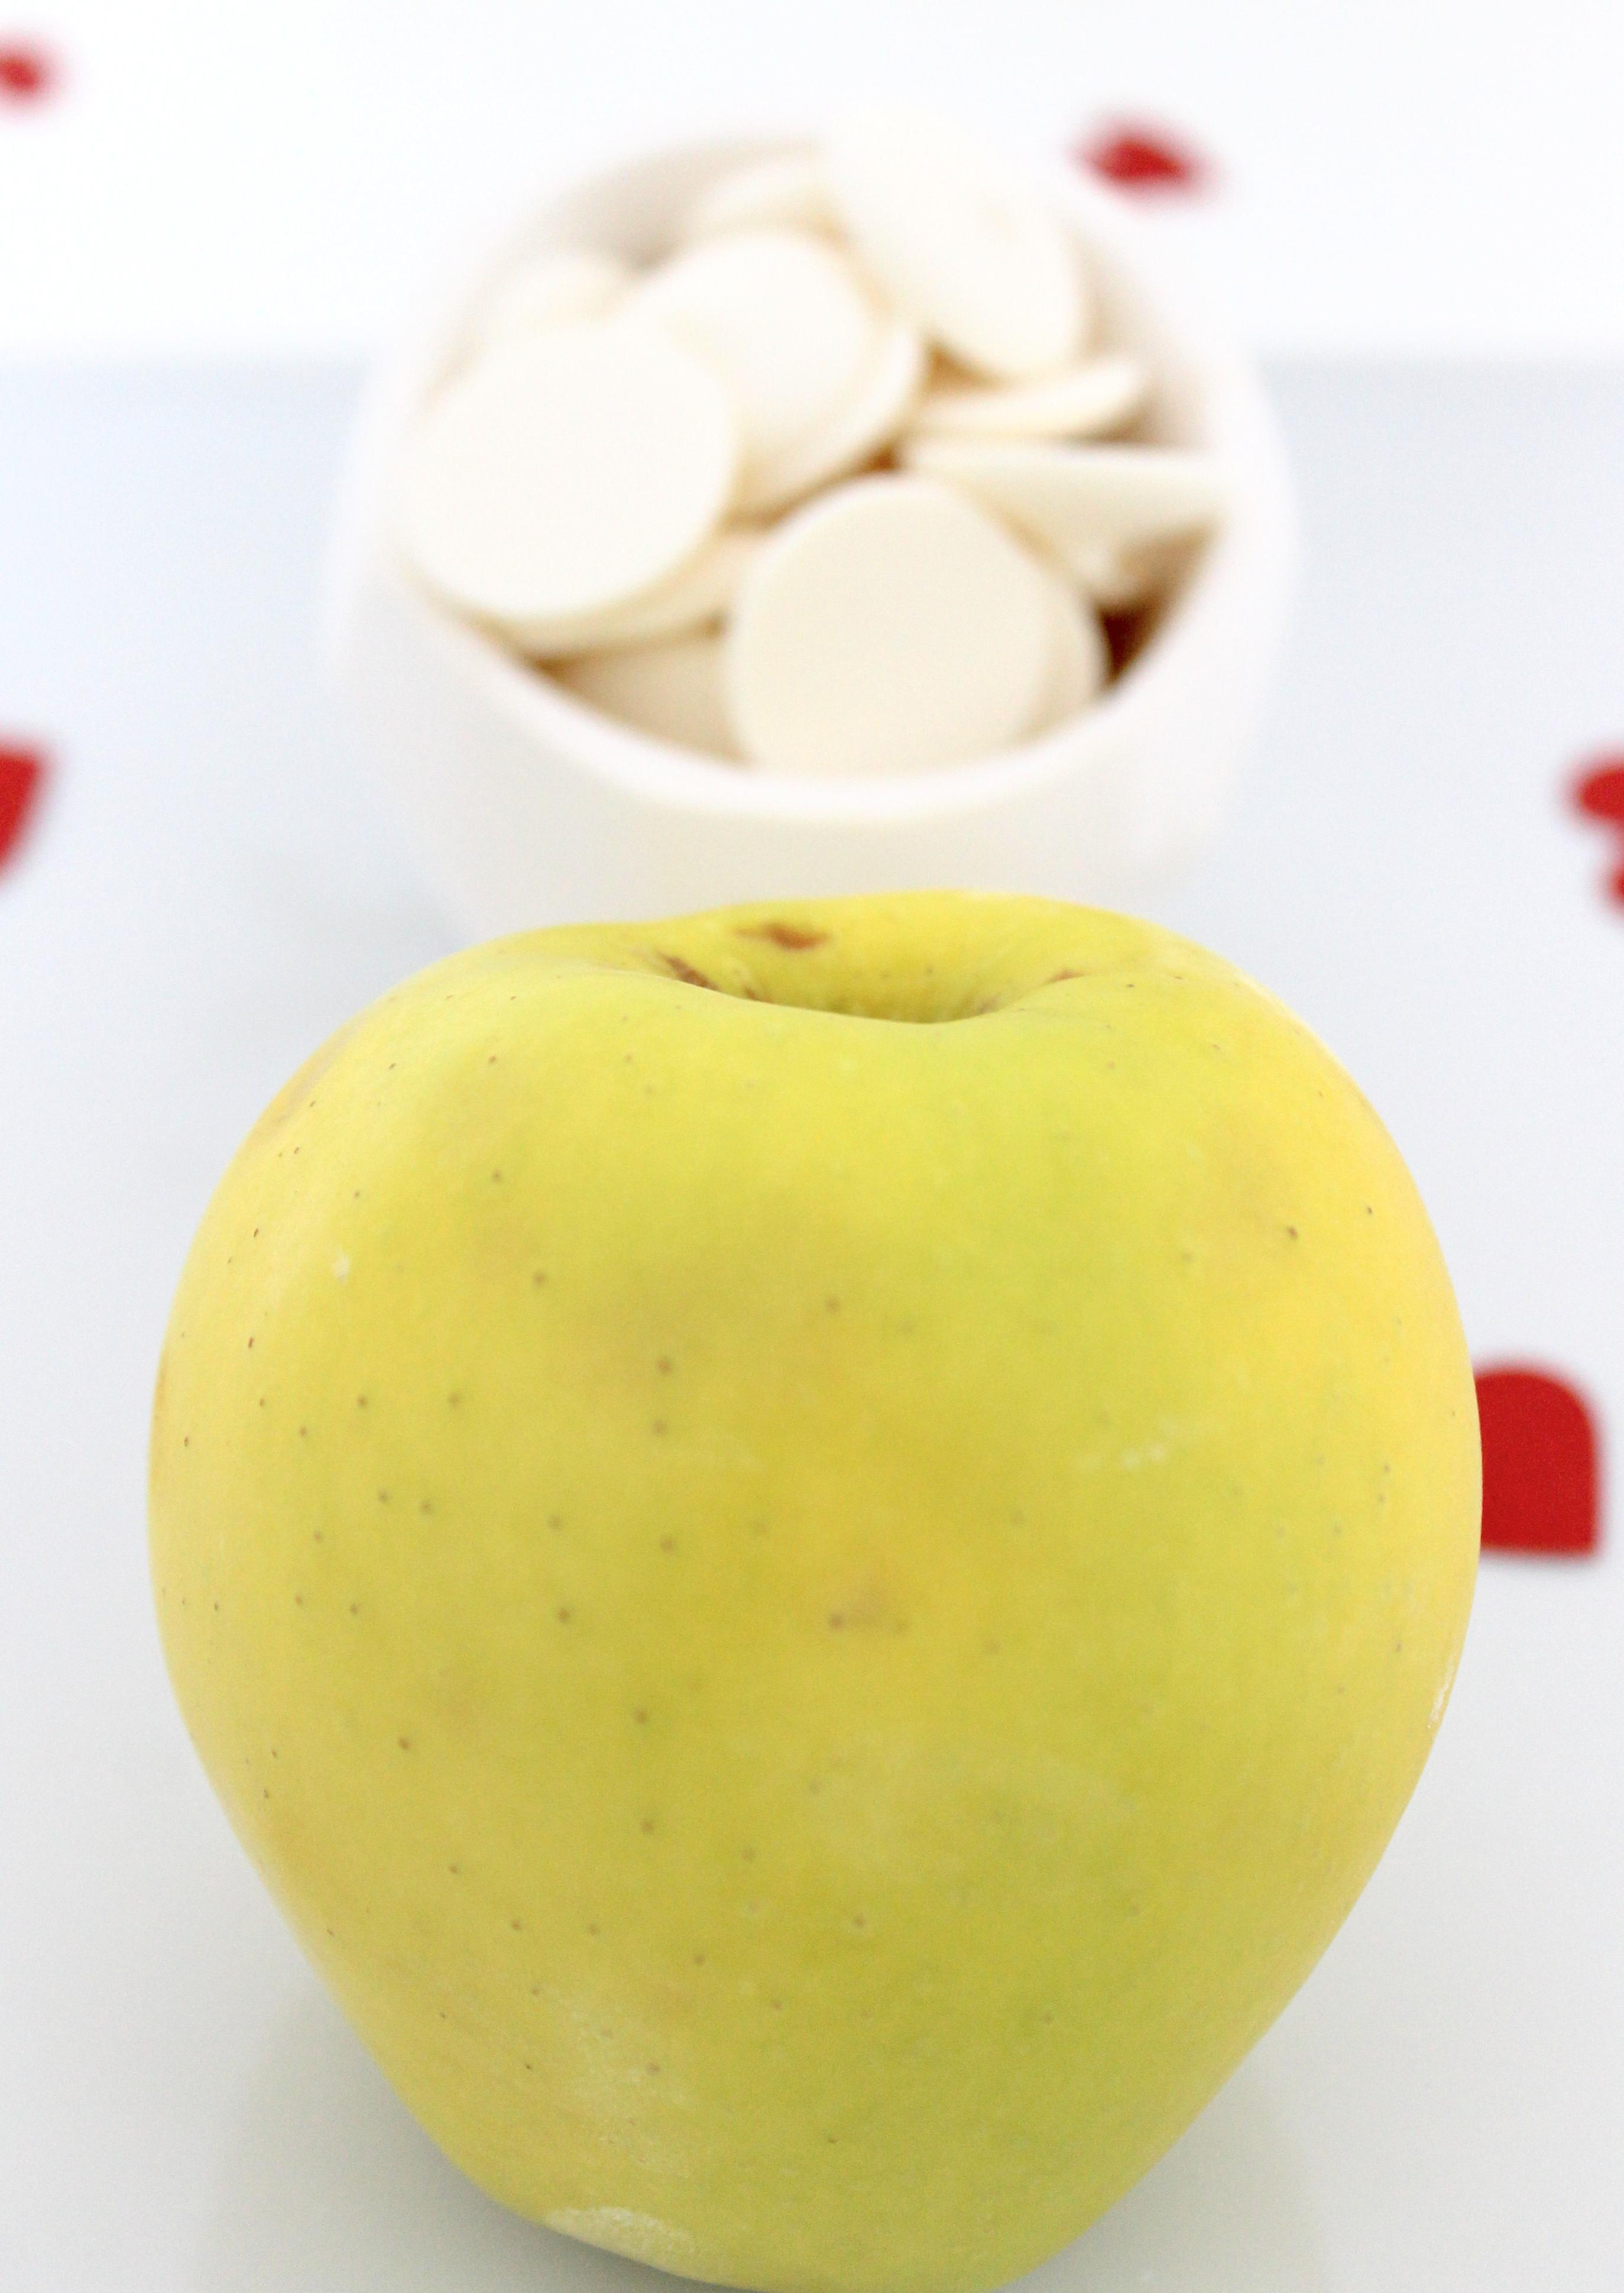 DIY Valentine's Day Apple with Chocolate